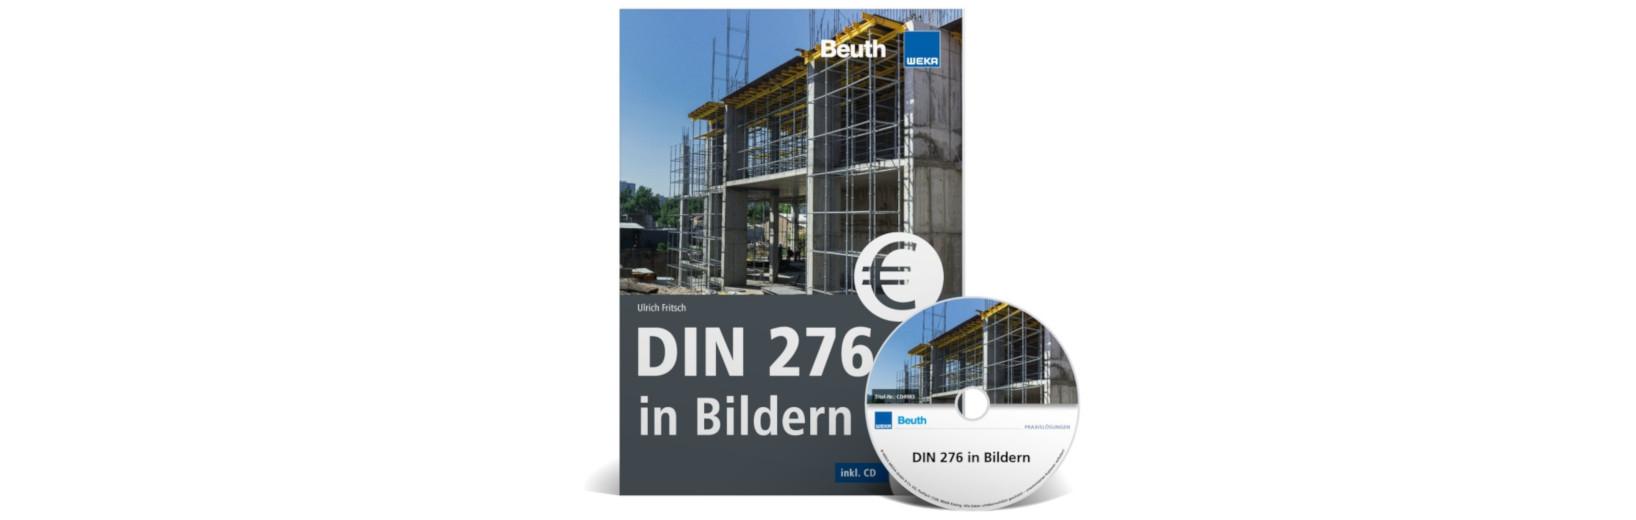 DIN276 in Bildern